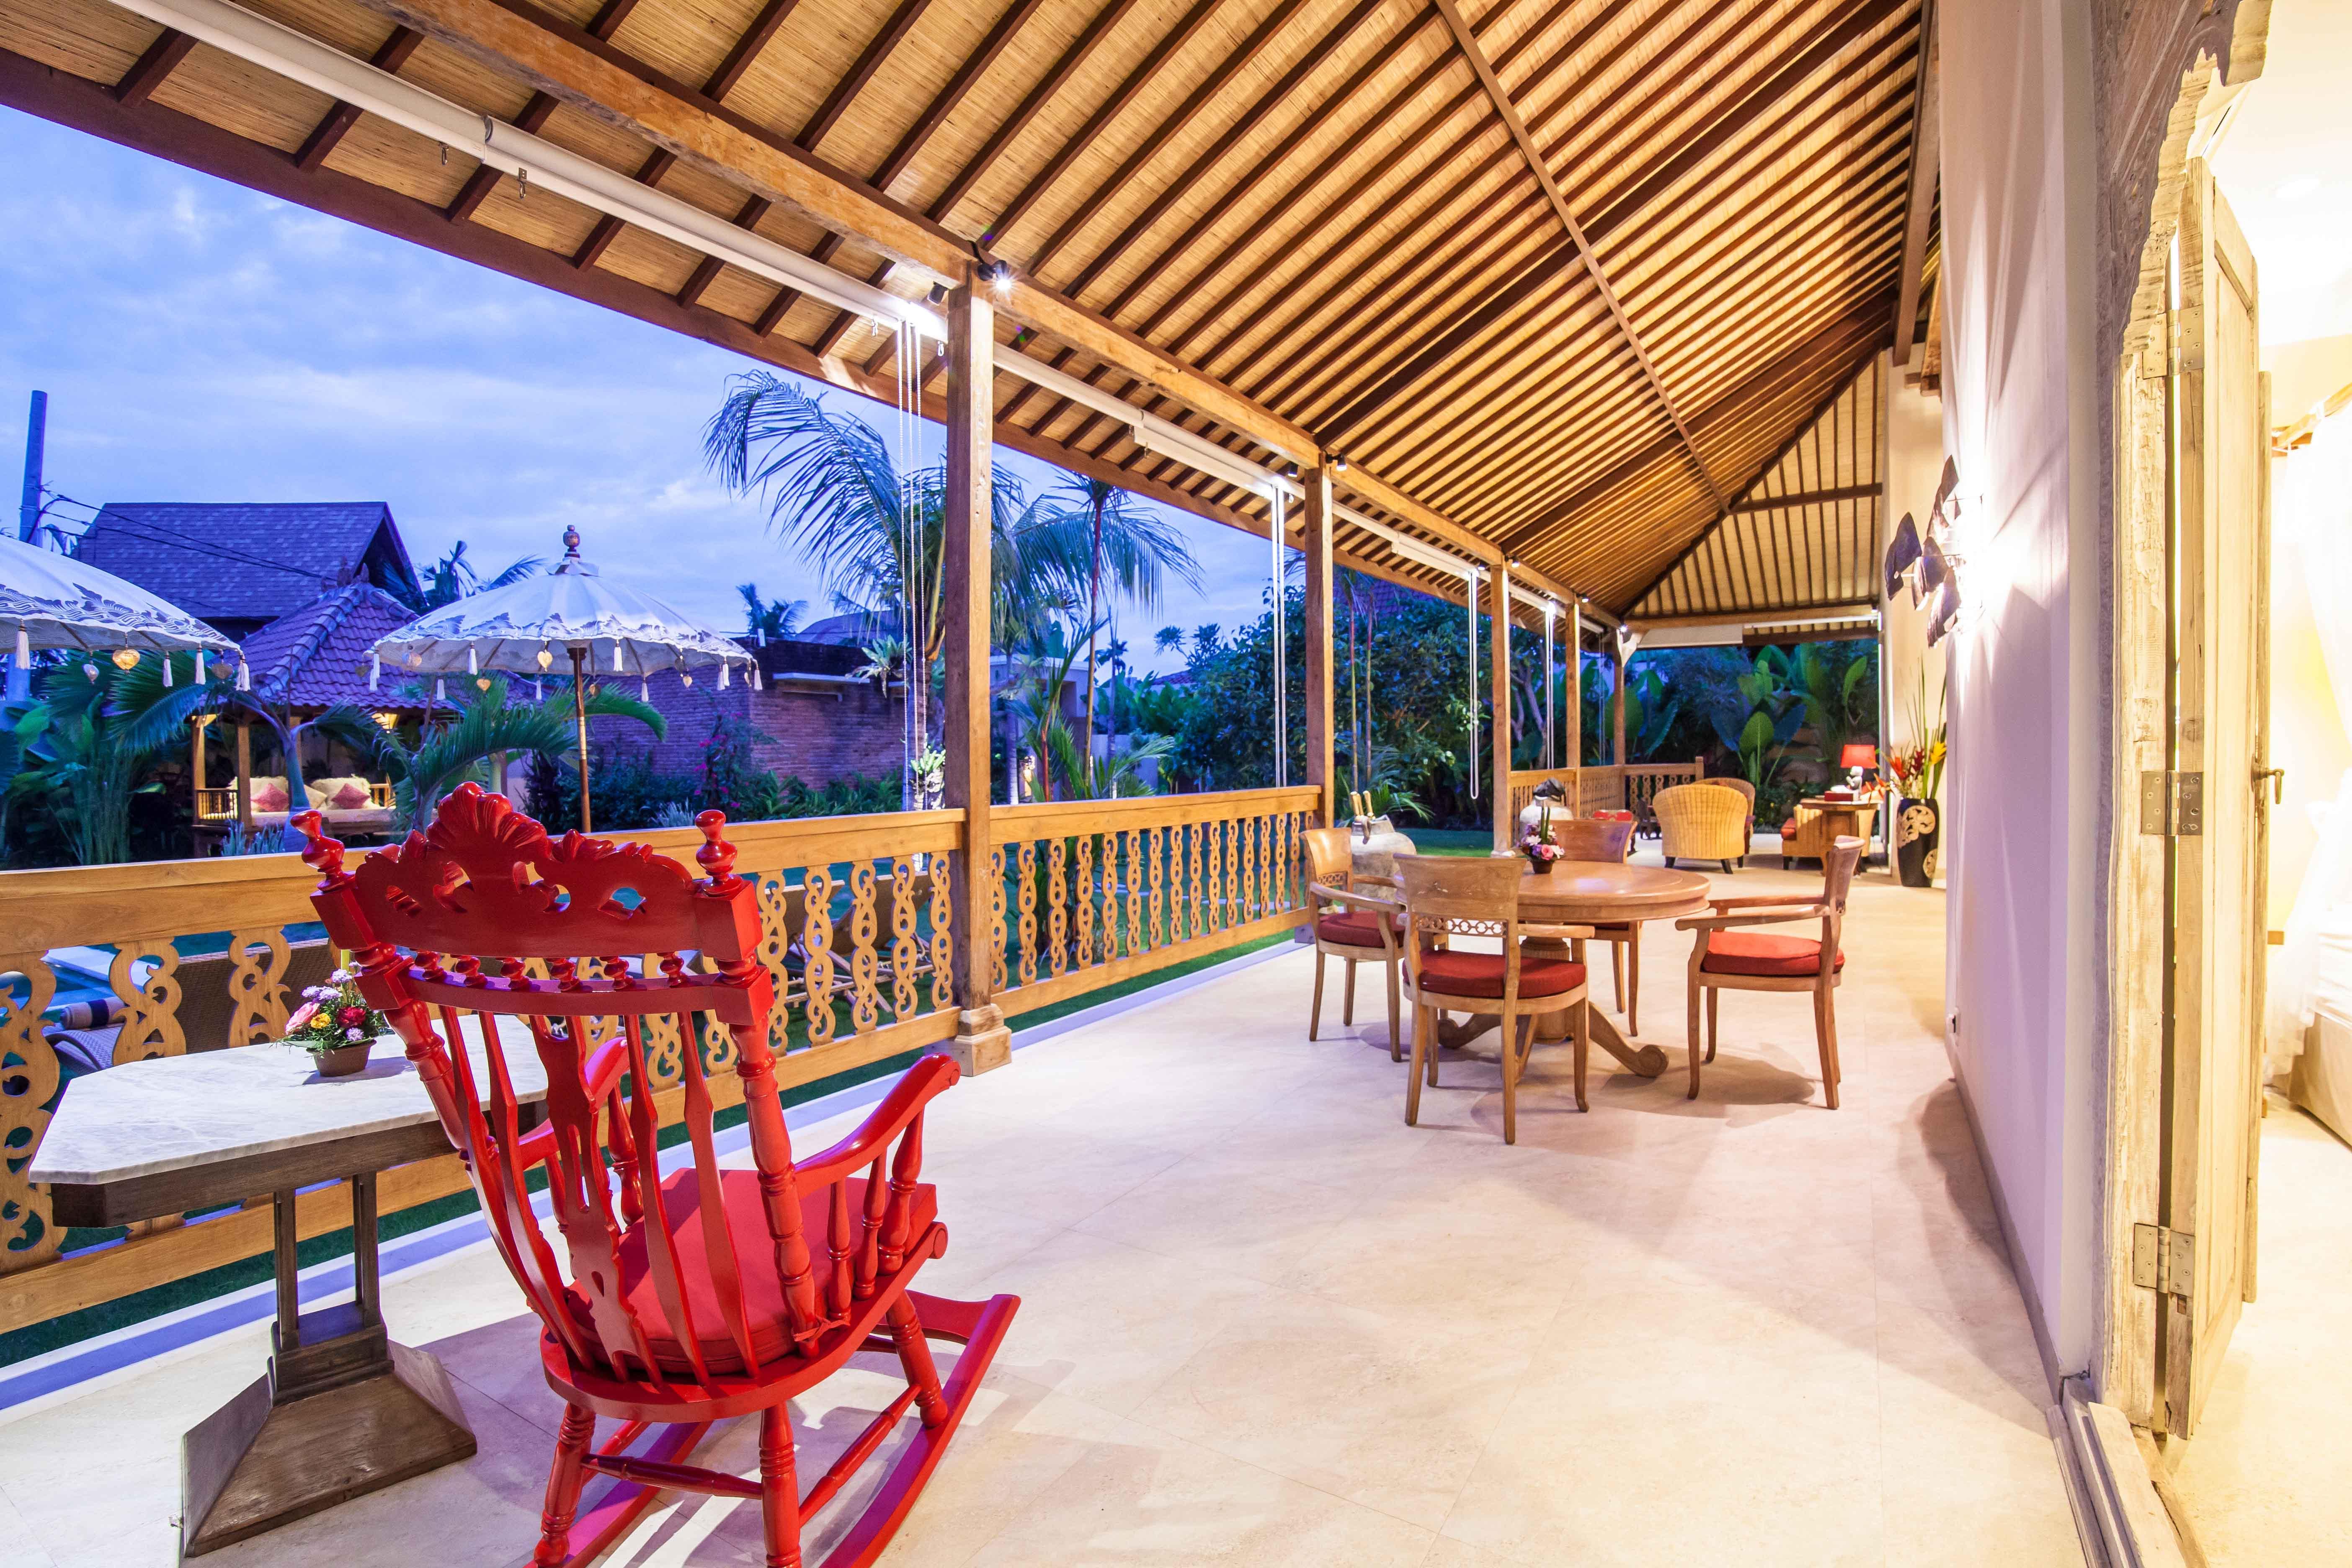 Balinb | Villa Kuda Sumba